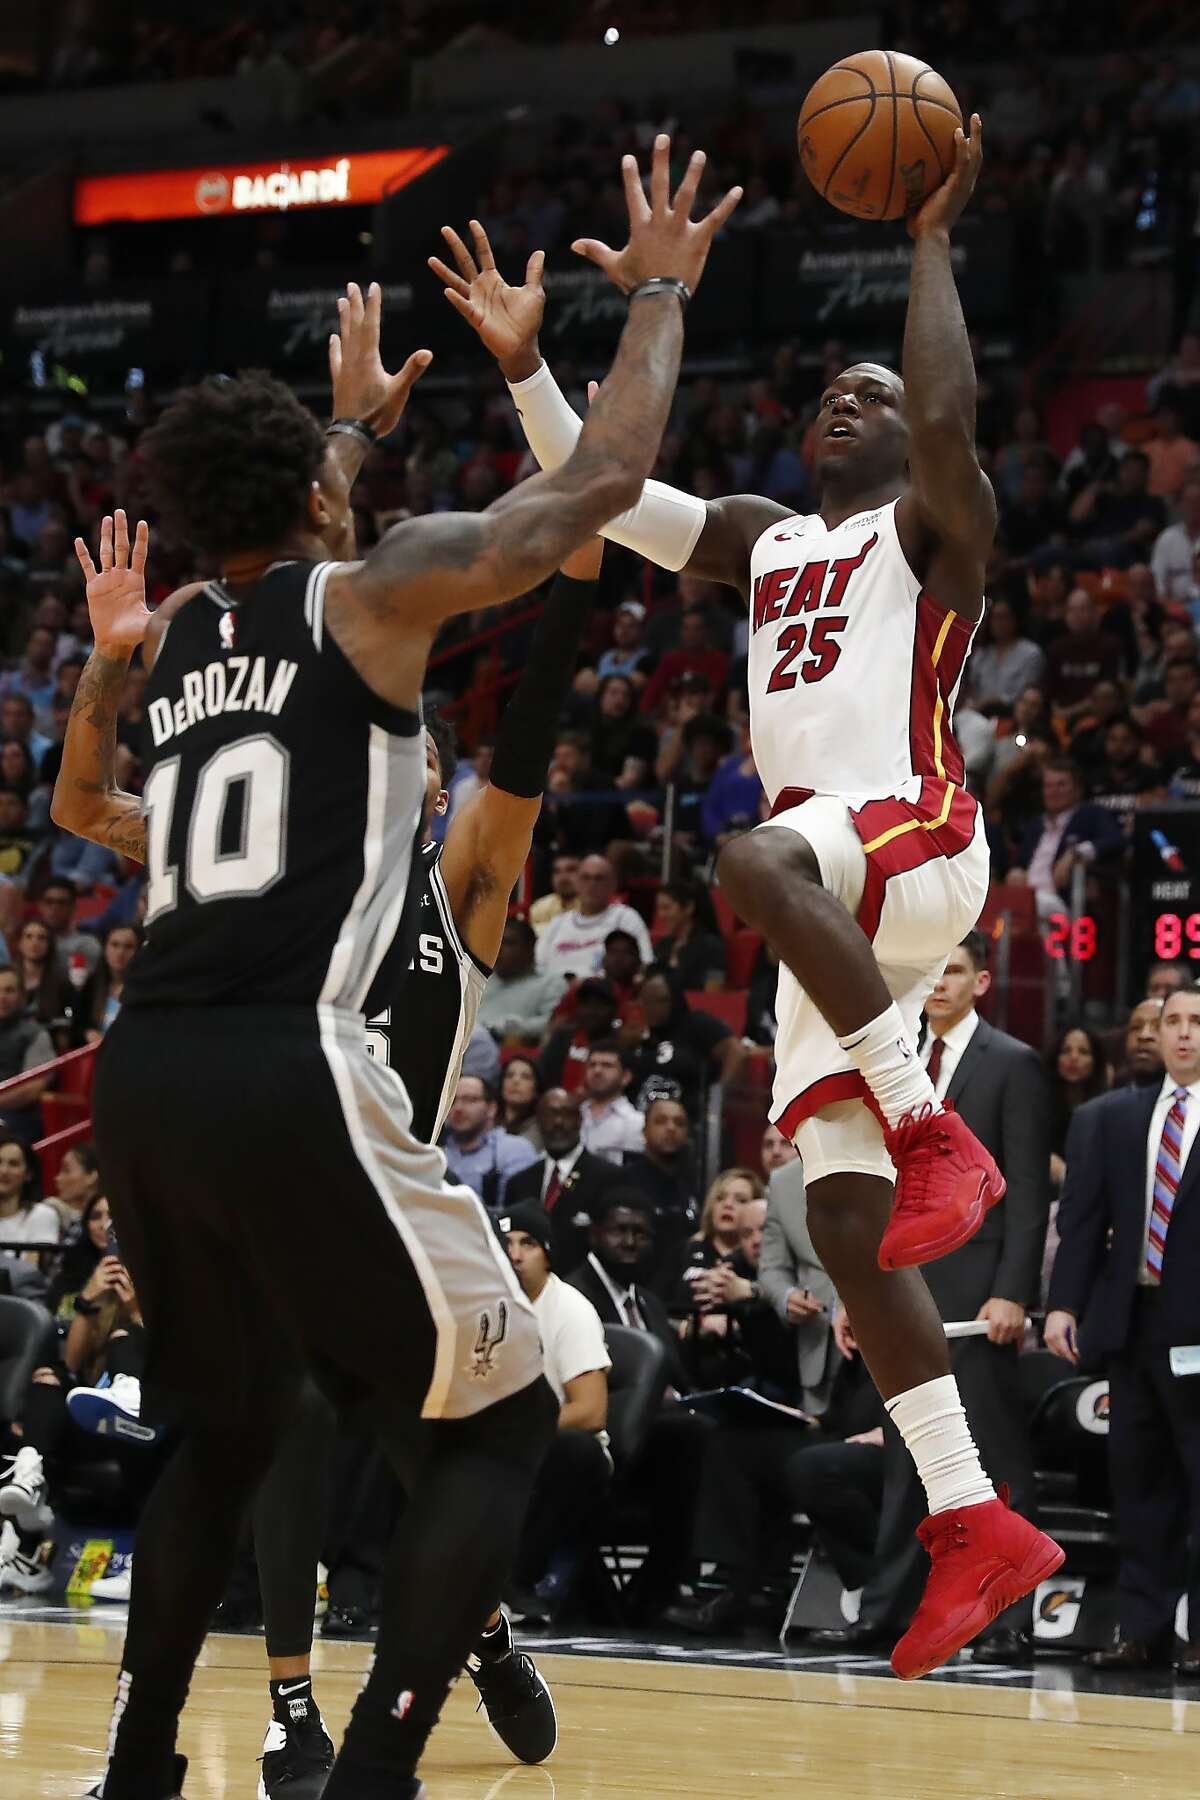 Miami Heat guard Kendrick Nunn (25) shoots the ball against San Antonio Spurs guard DeMar DeRozan (10) in the second half of an NBA basketball game, Wednesday, Jan. 15, 2020, in Miami. (AP Photo/Brynn Anderson)